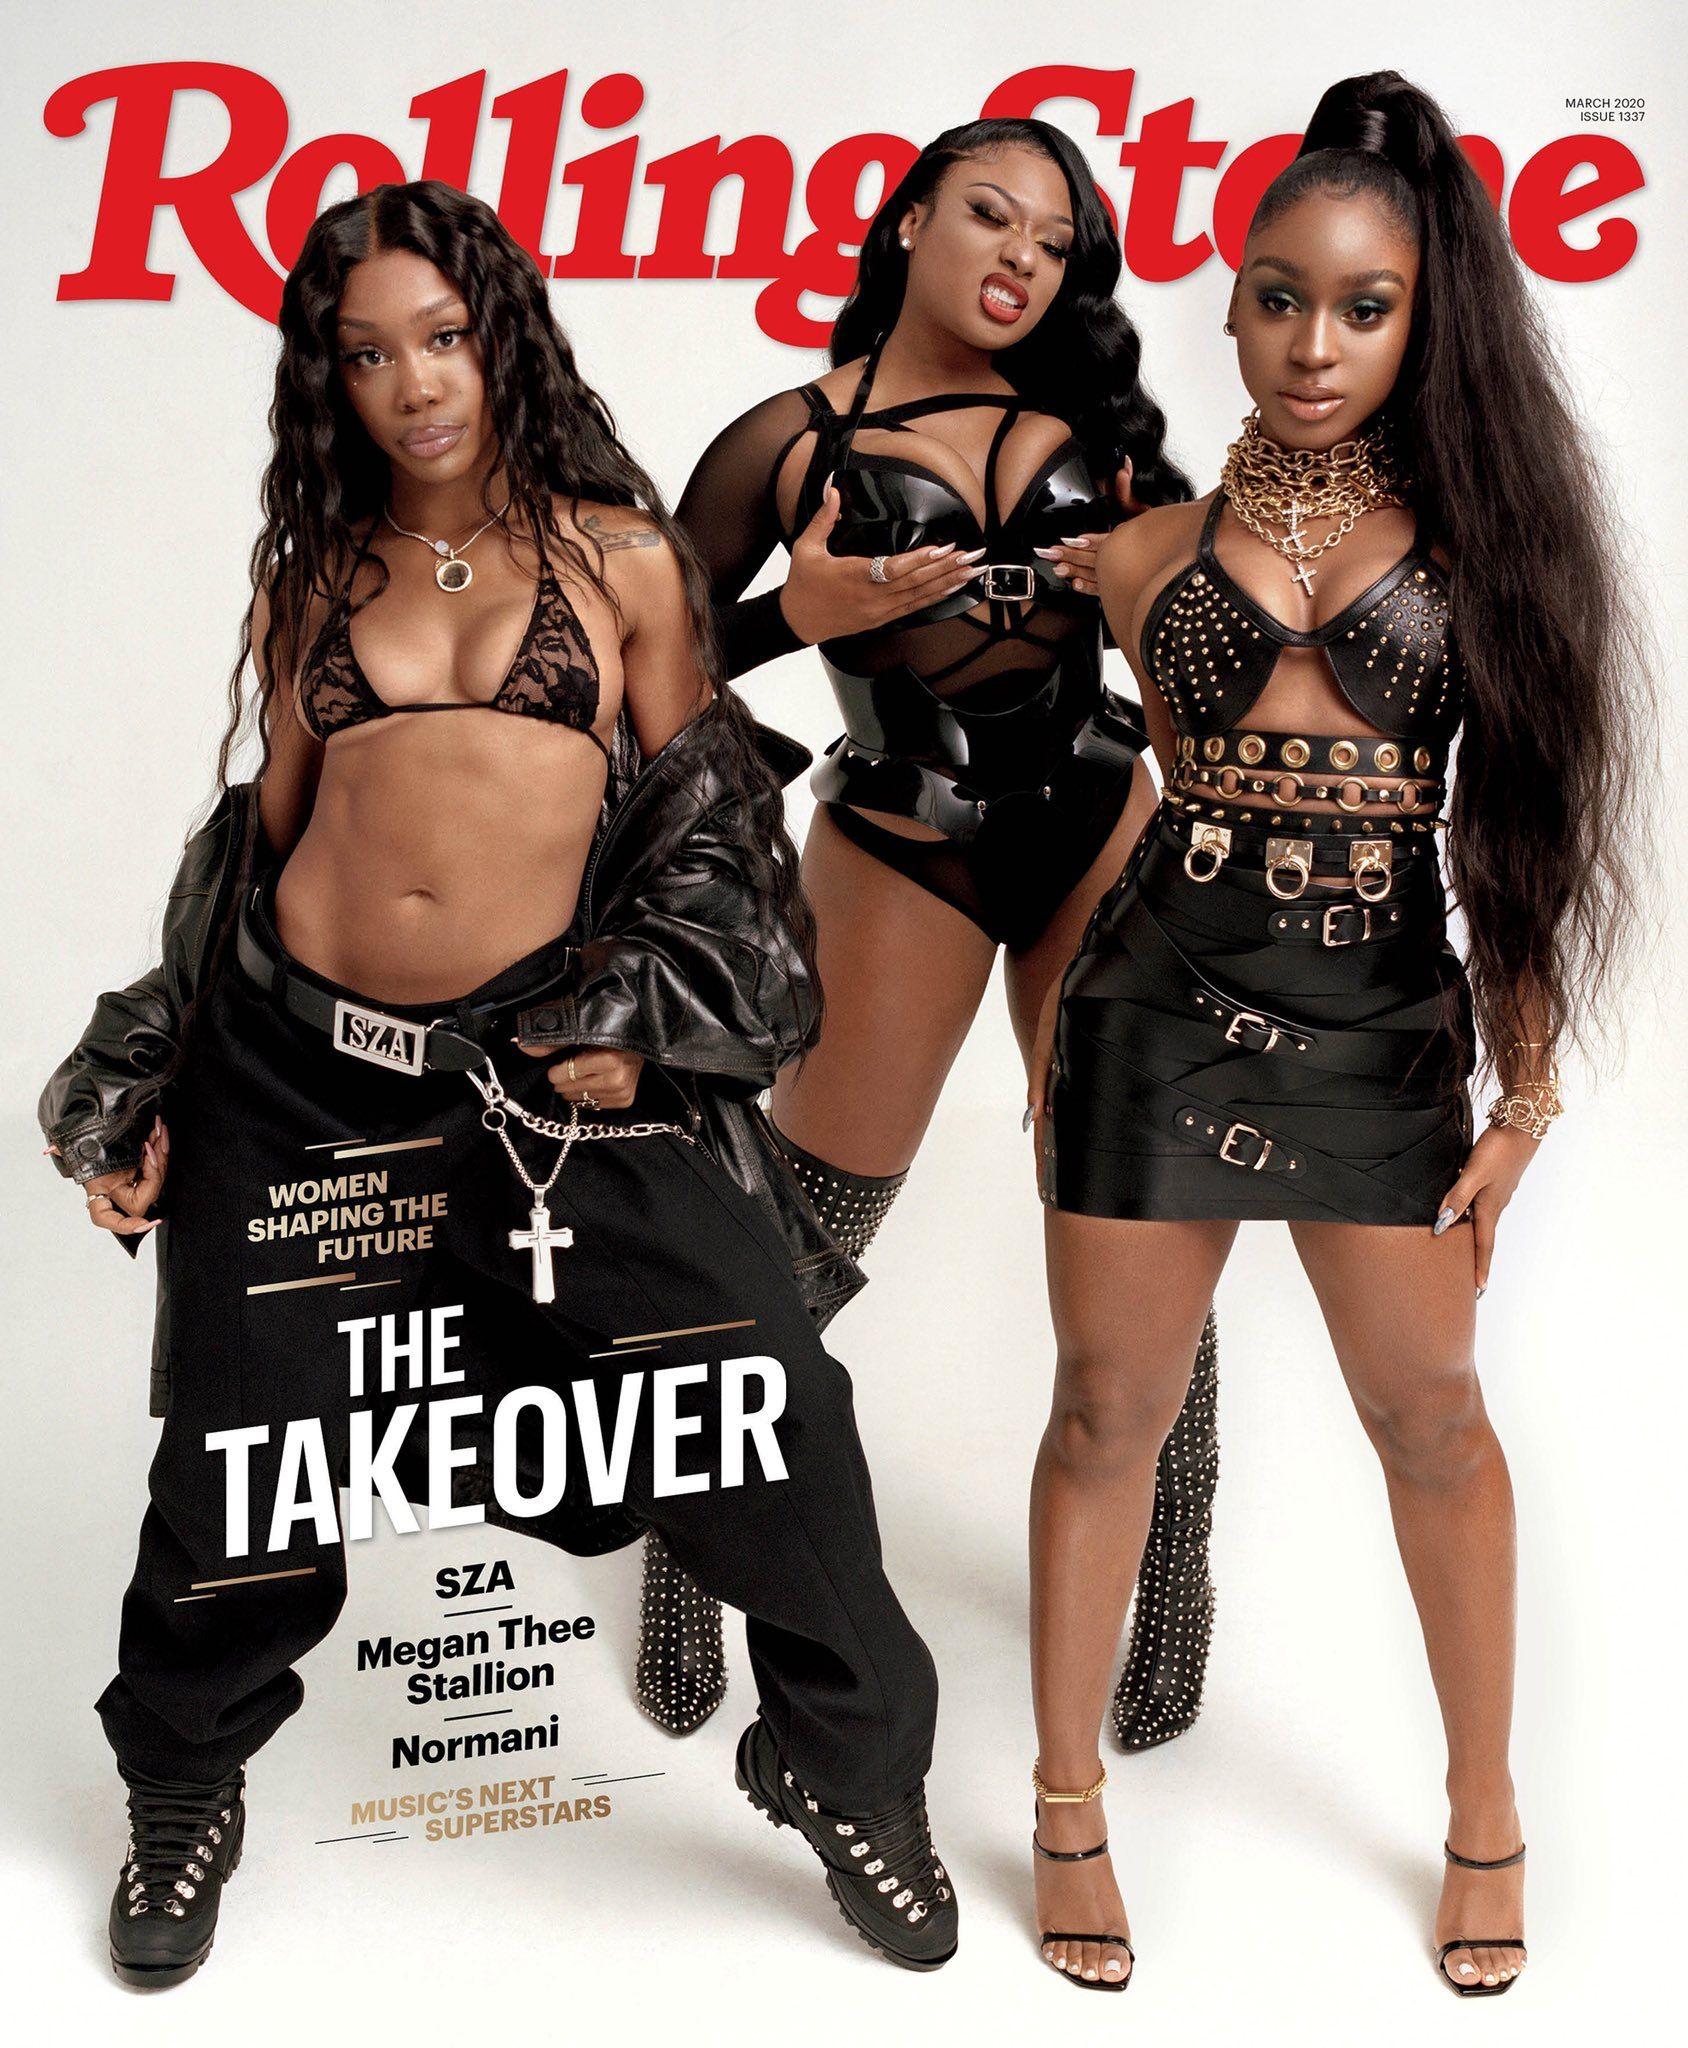 Pin By Regentcouture On Inspiratipn In 2020 Black Girl Aesthetic Black Magazine Female Rappers